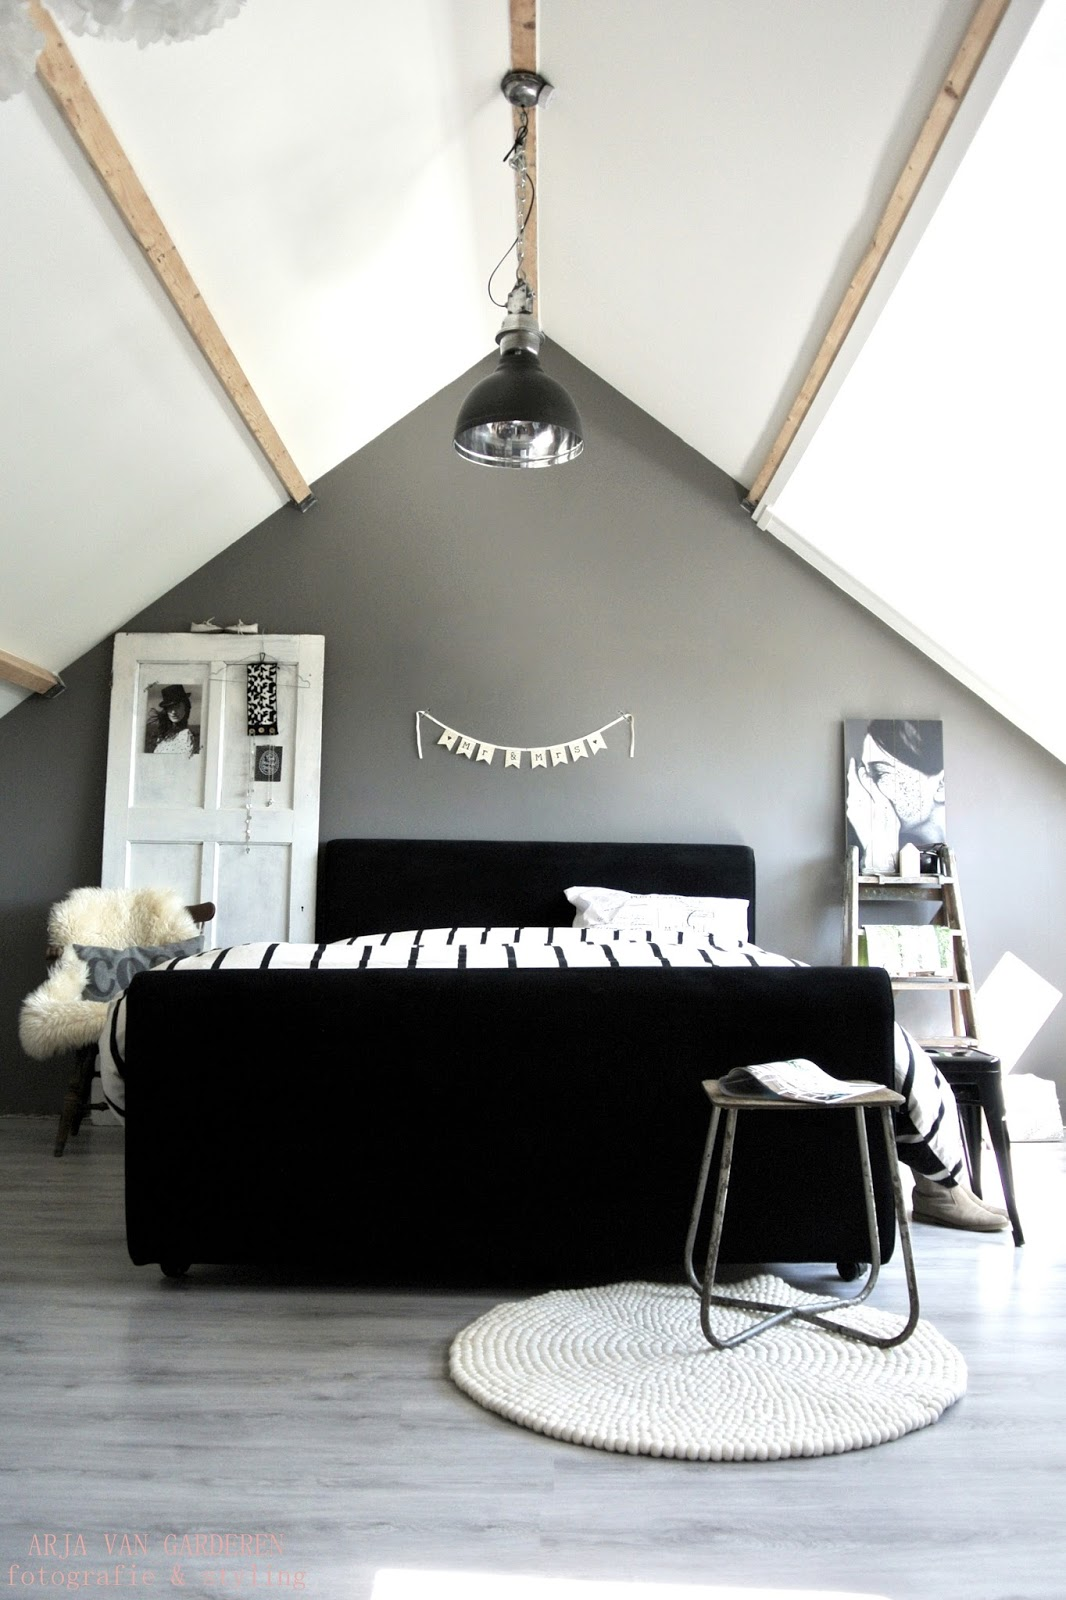 nl.funvit | design hanglamp slaapkamer, Deco ideeën